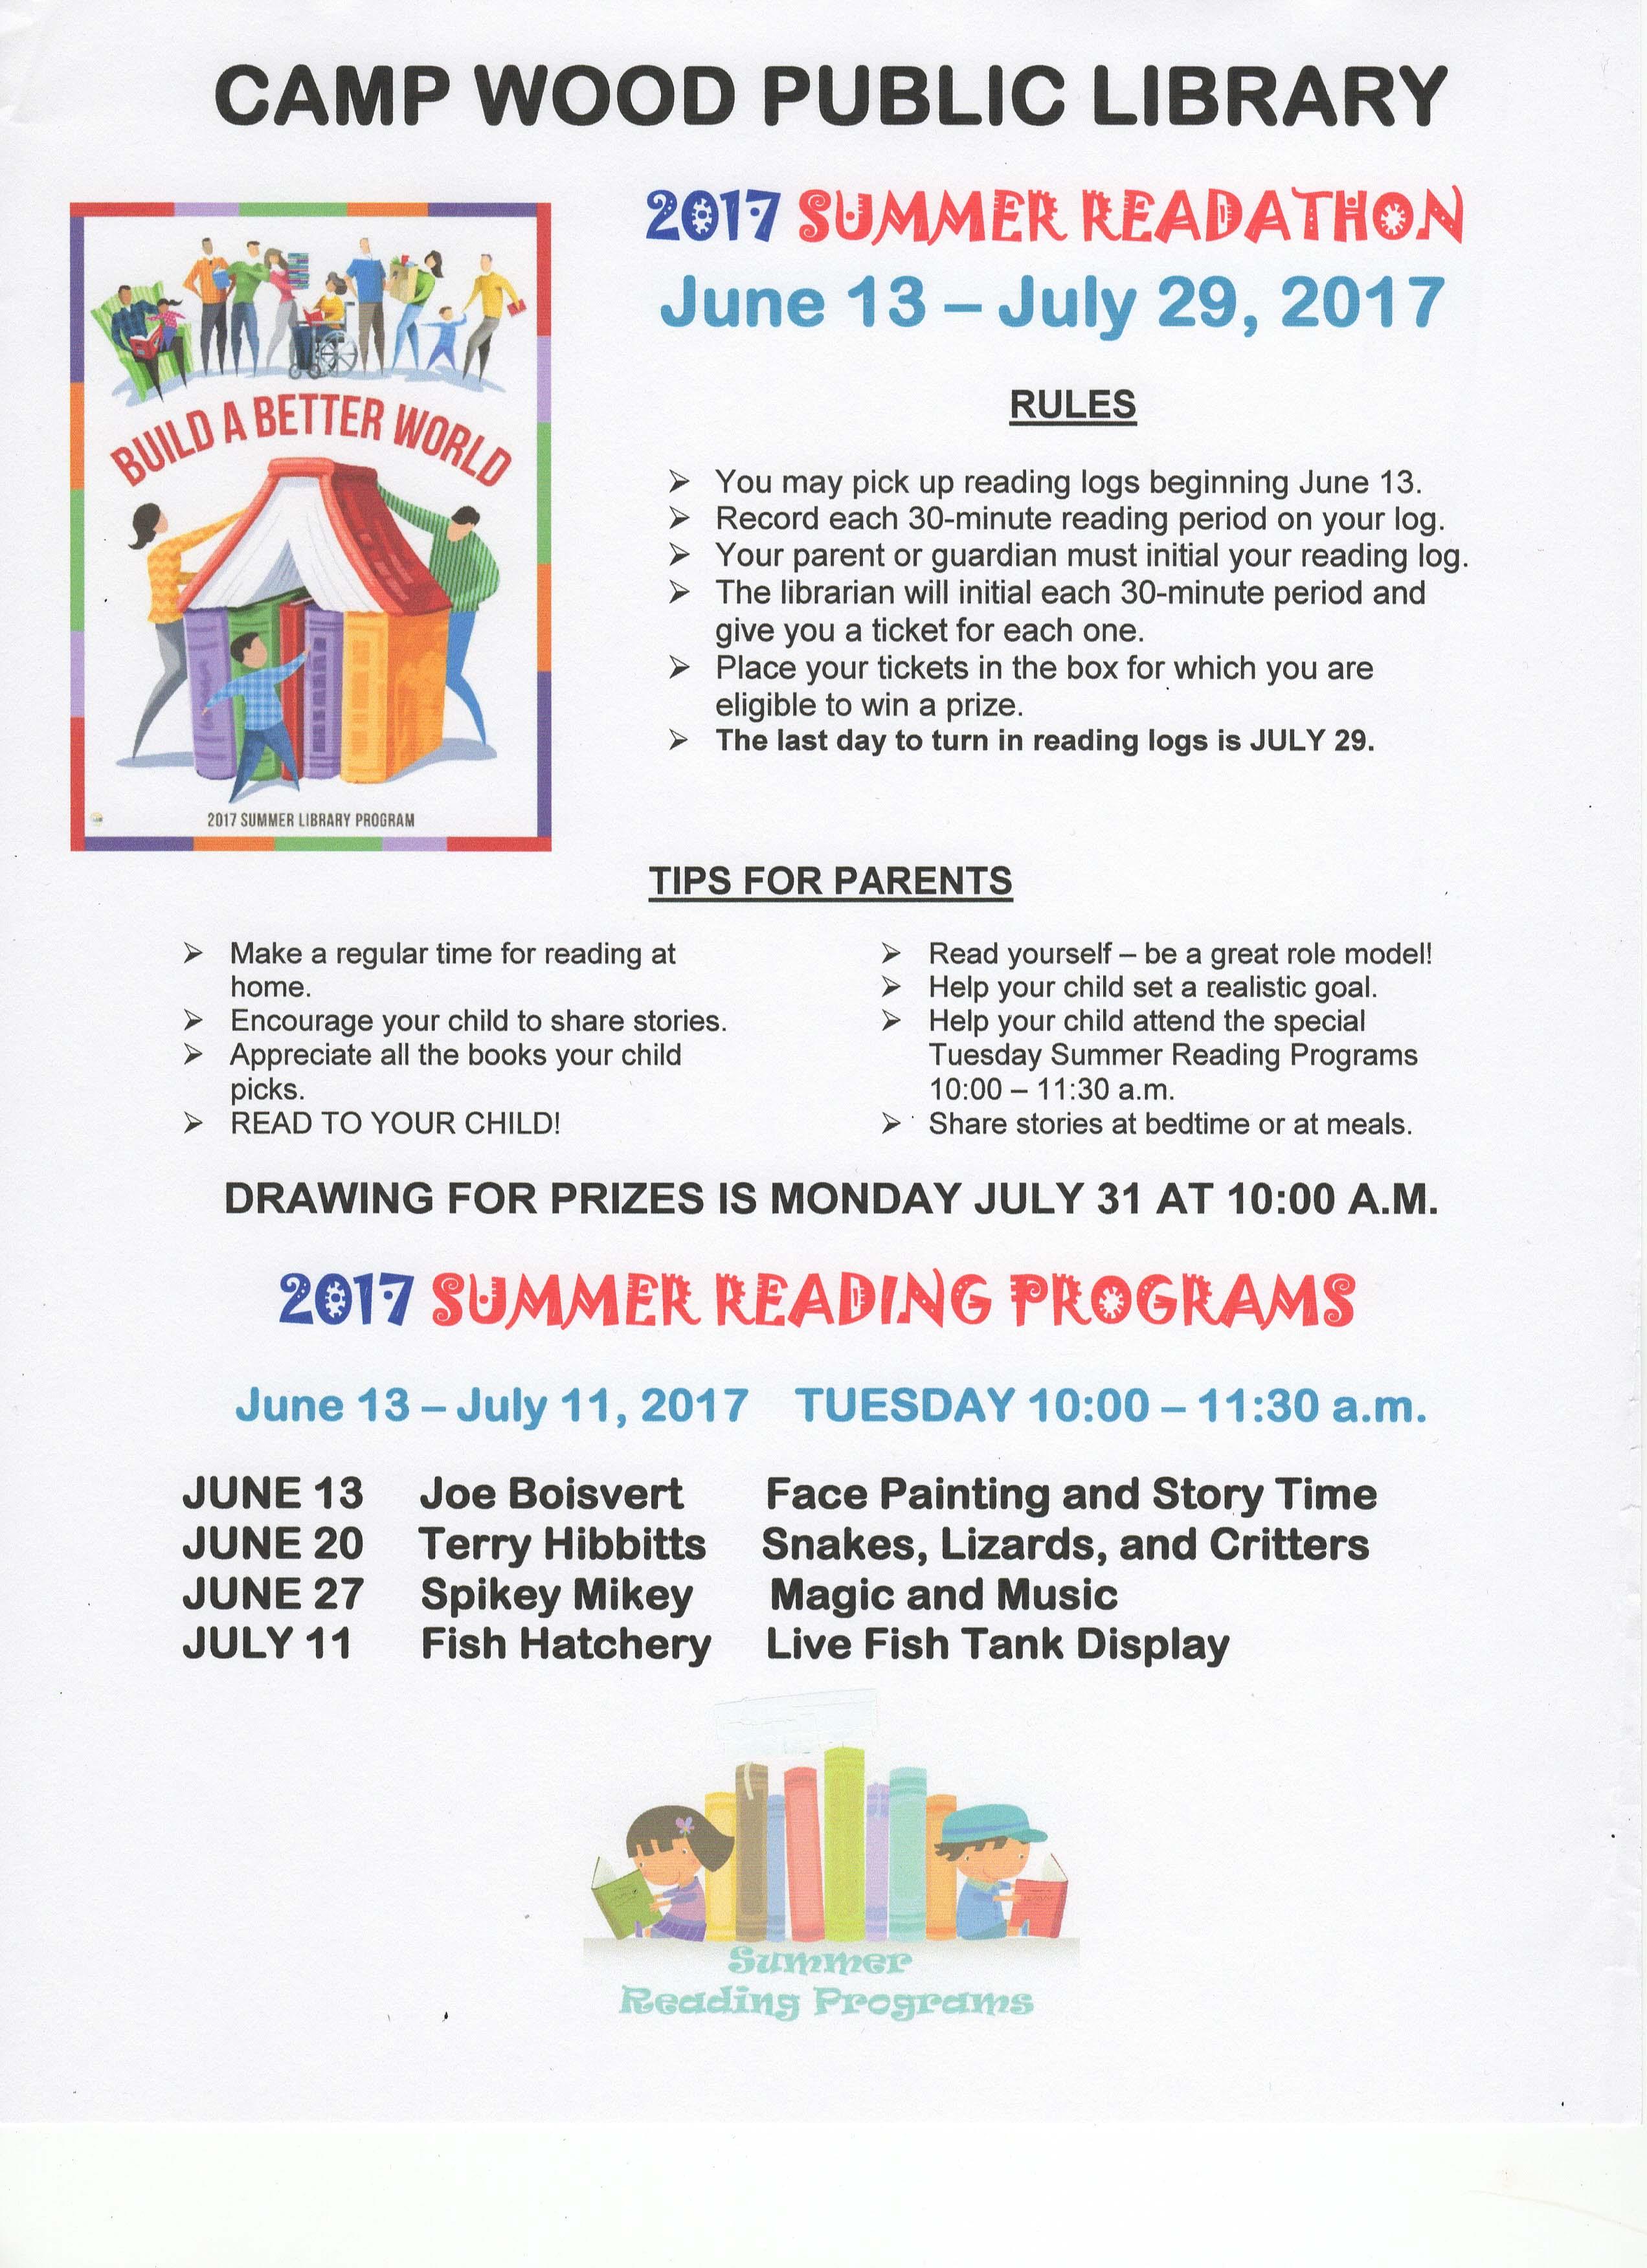 2017 Summer Reading Program Events/Dates